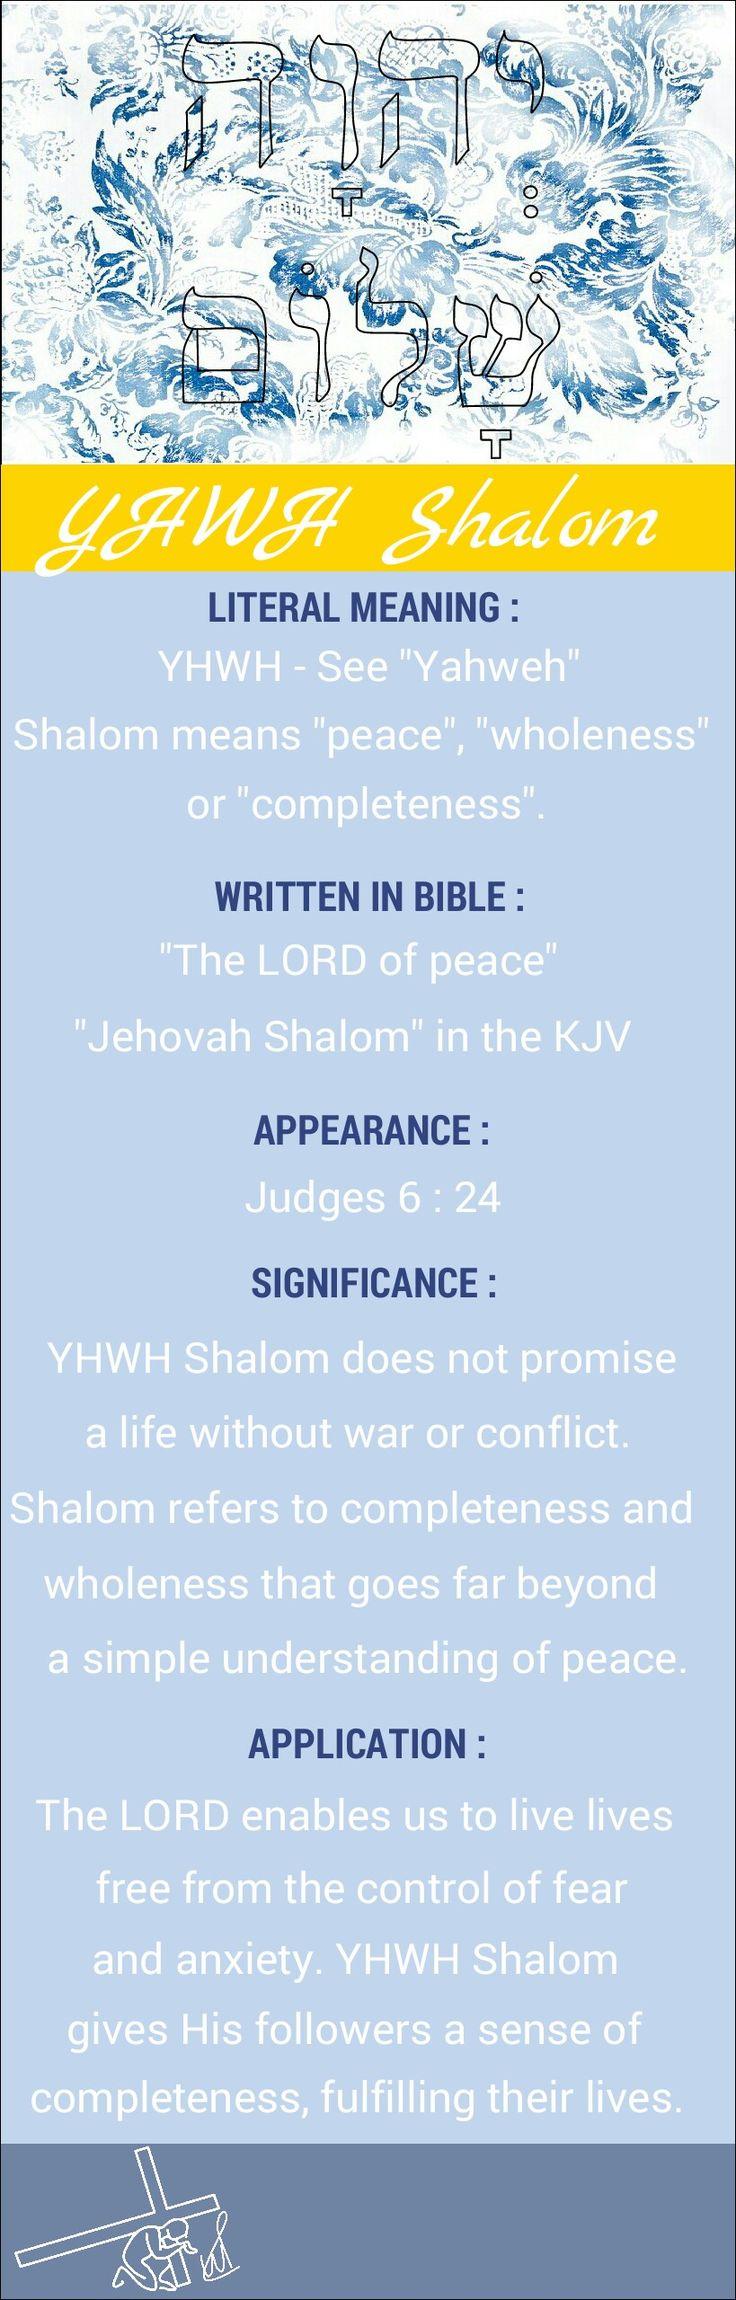 Names of God YHWH Shalom Yahweh Shalom Jehovah Shalom The LORD of peace